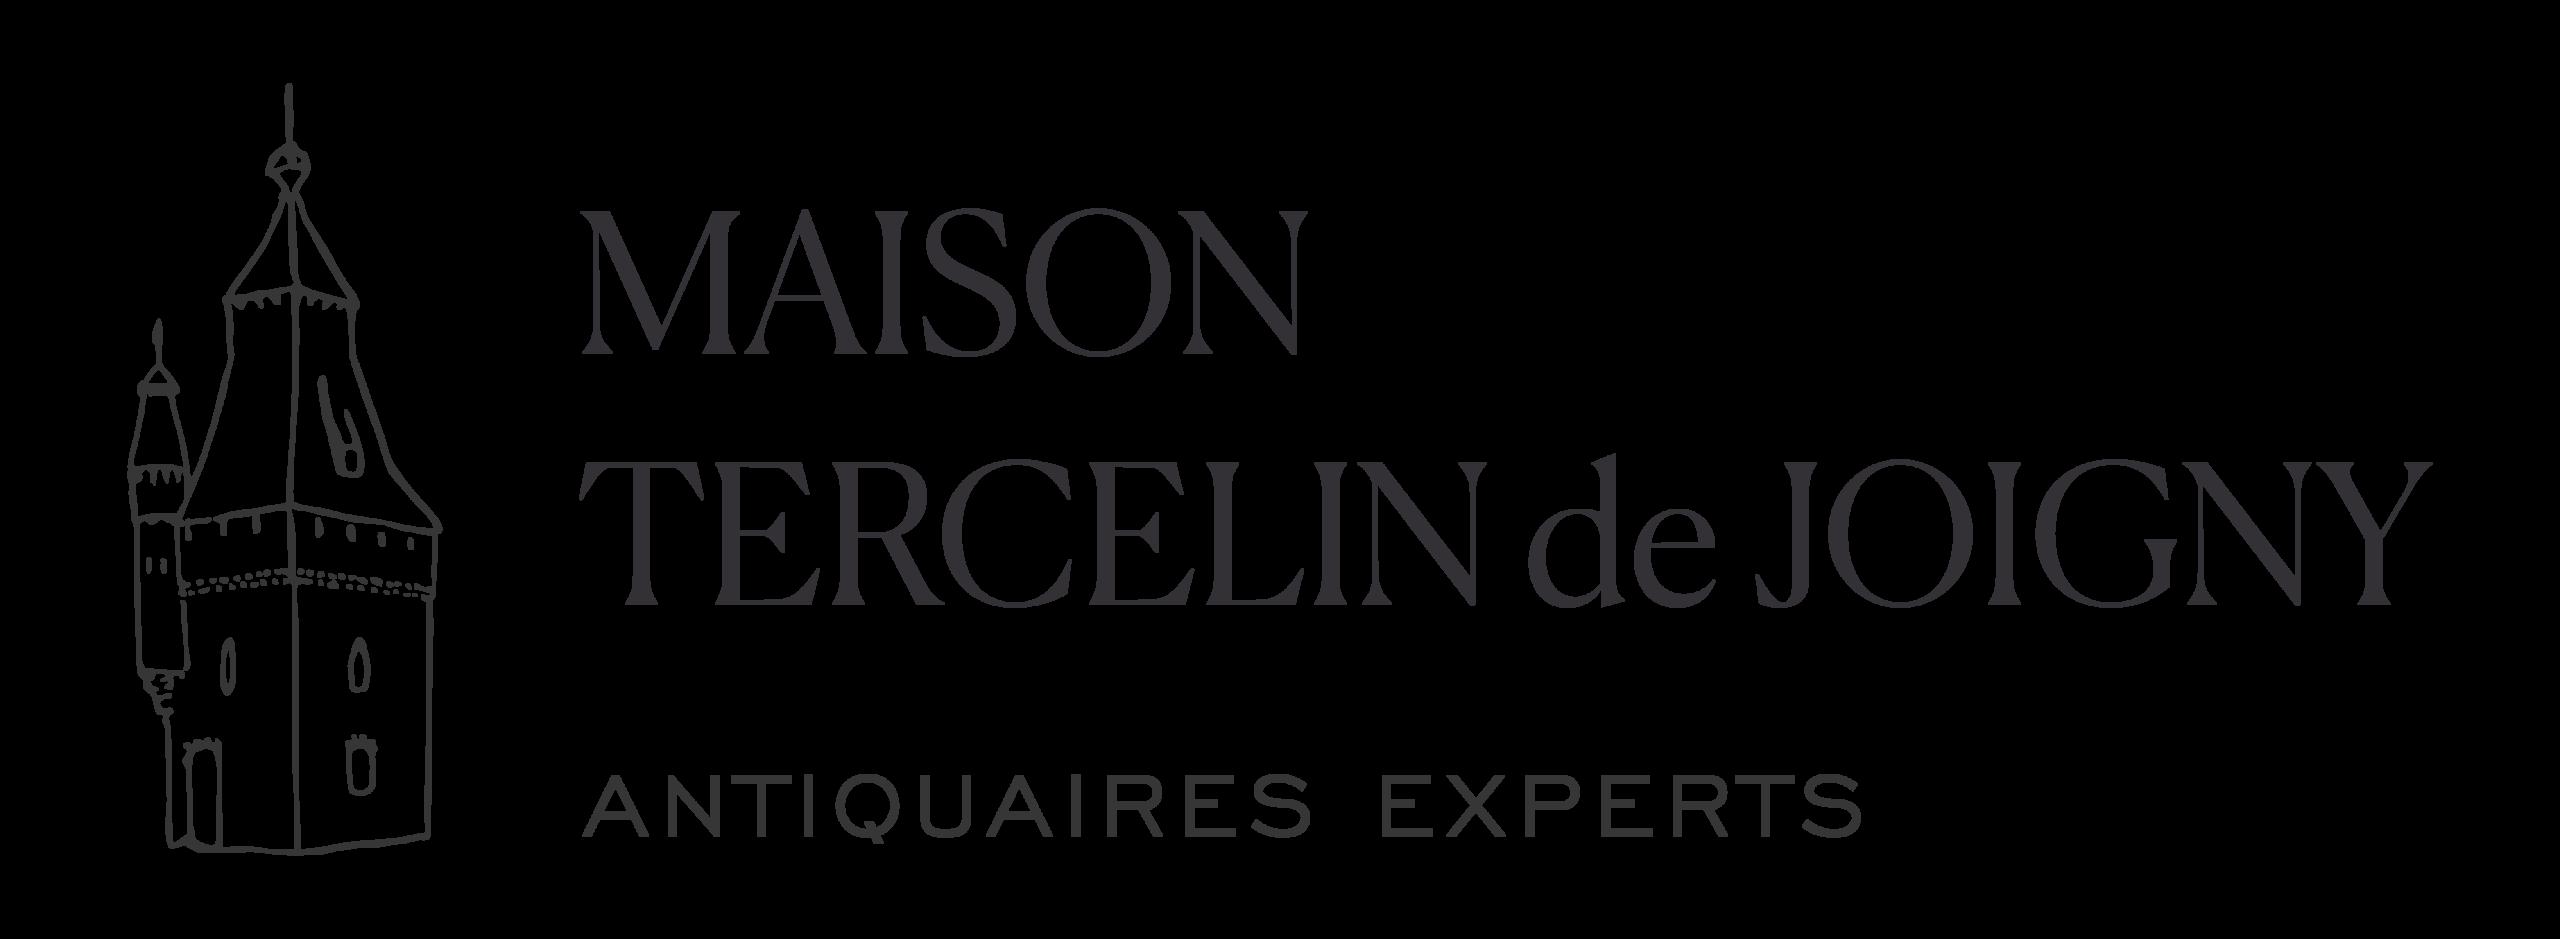 Maison Tercelin de Joigny